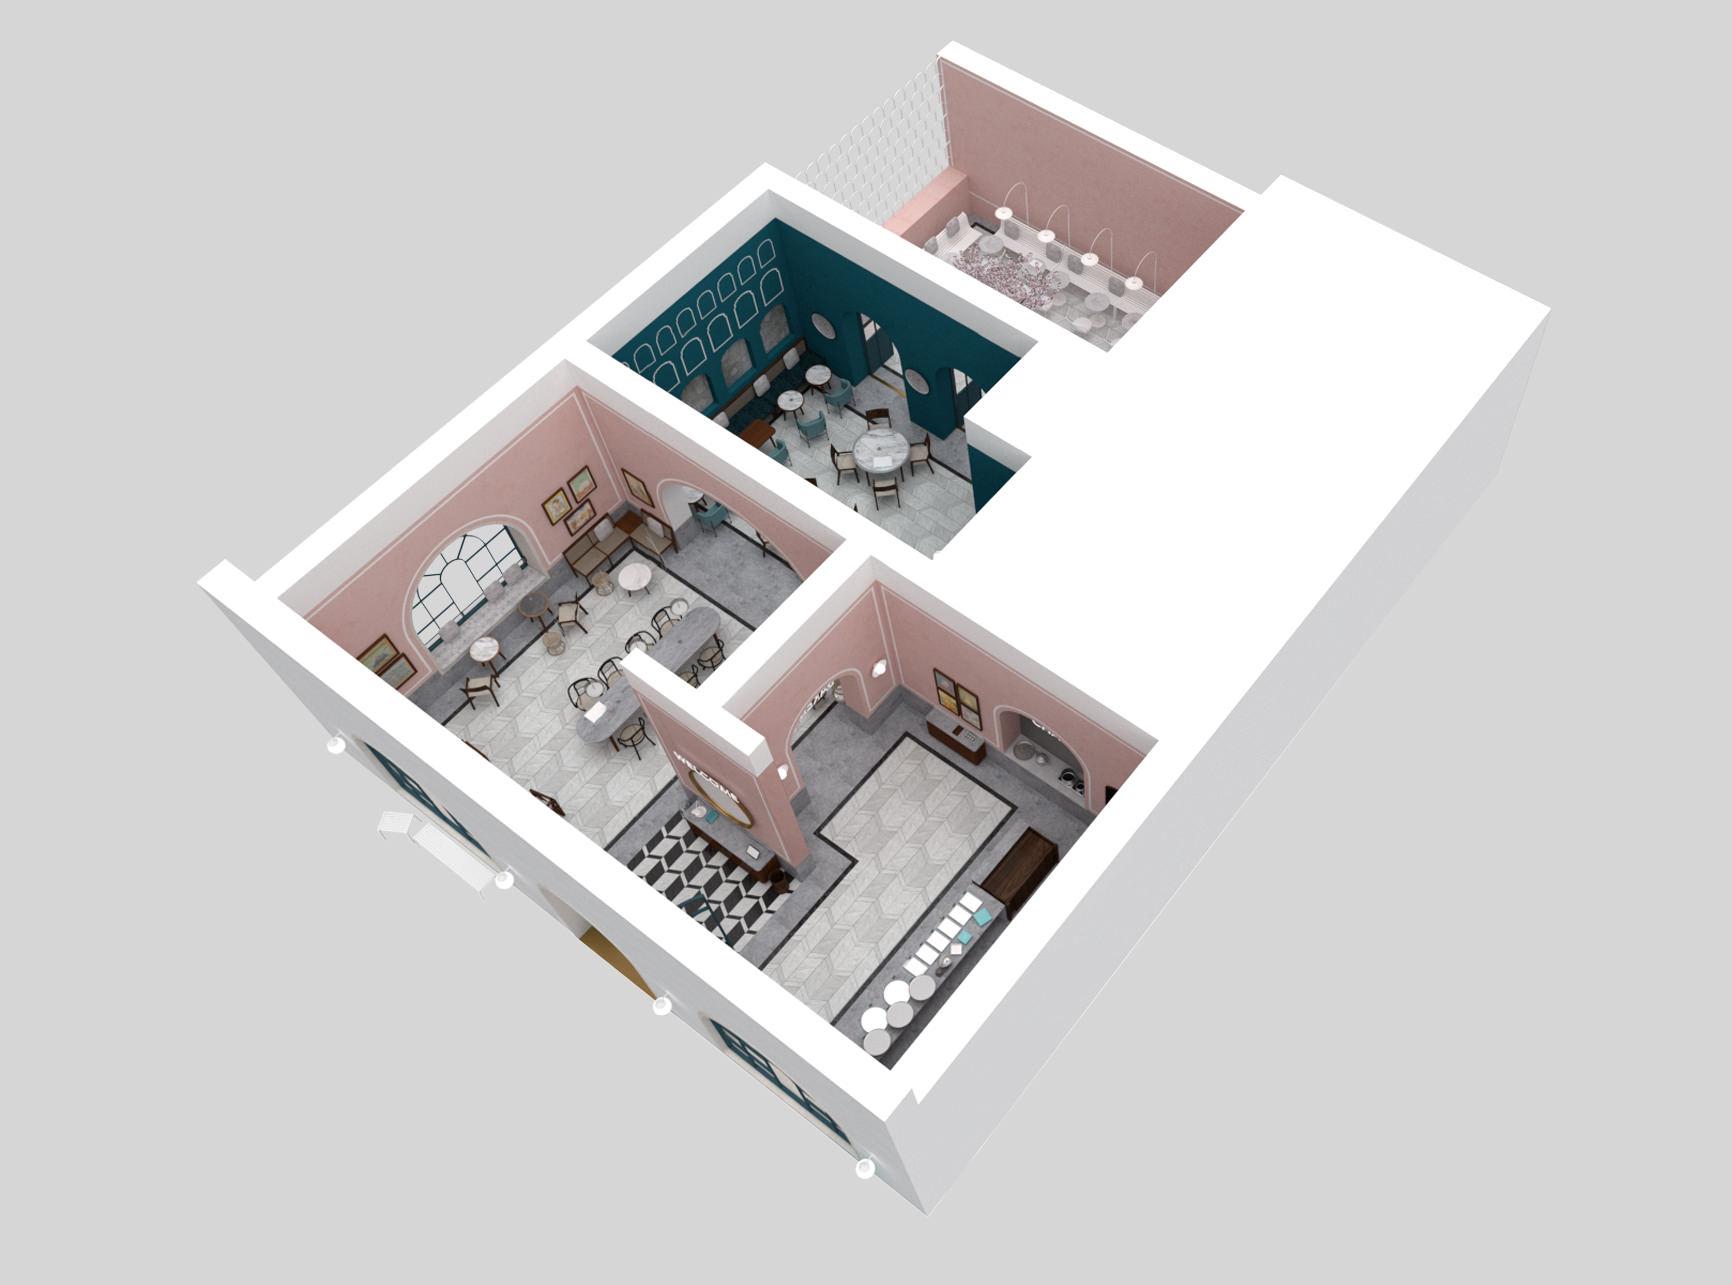 lunarlunar_interior_design_cafe_bakery_restaurant_pistachio_rose_AXO View 2.jpg